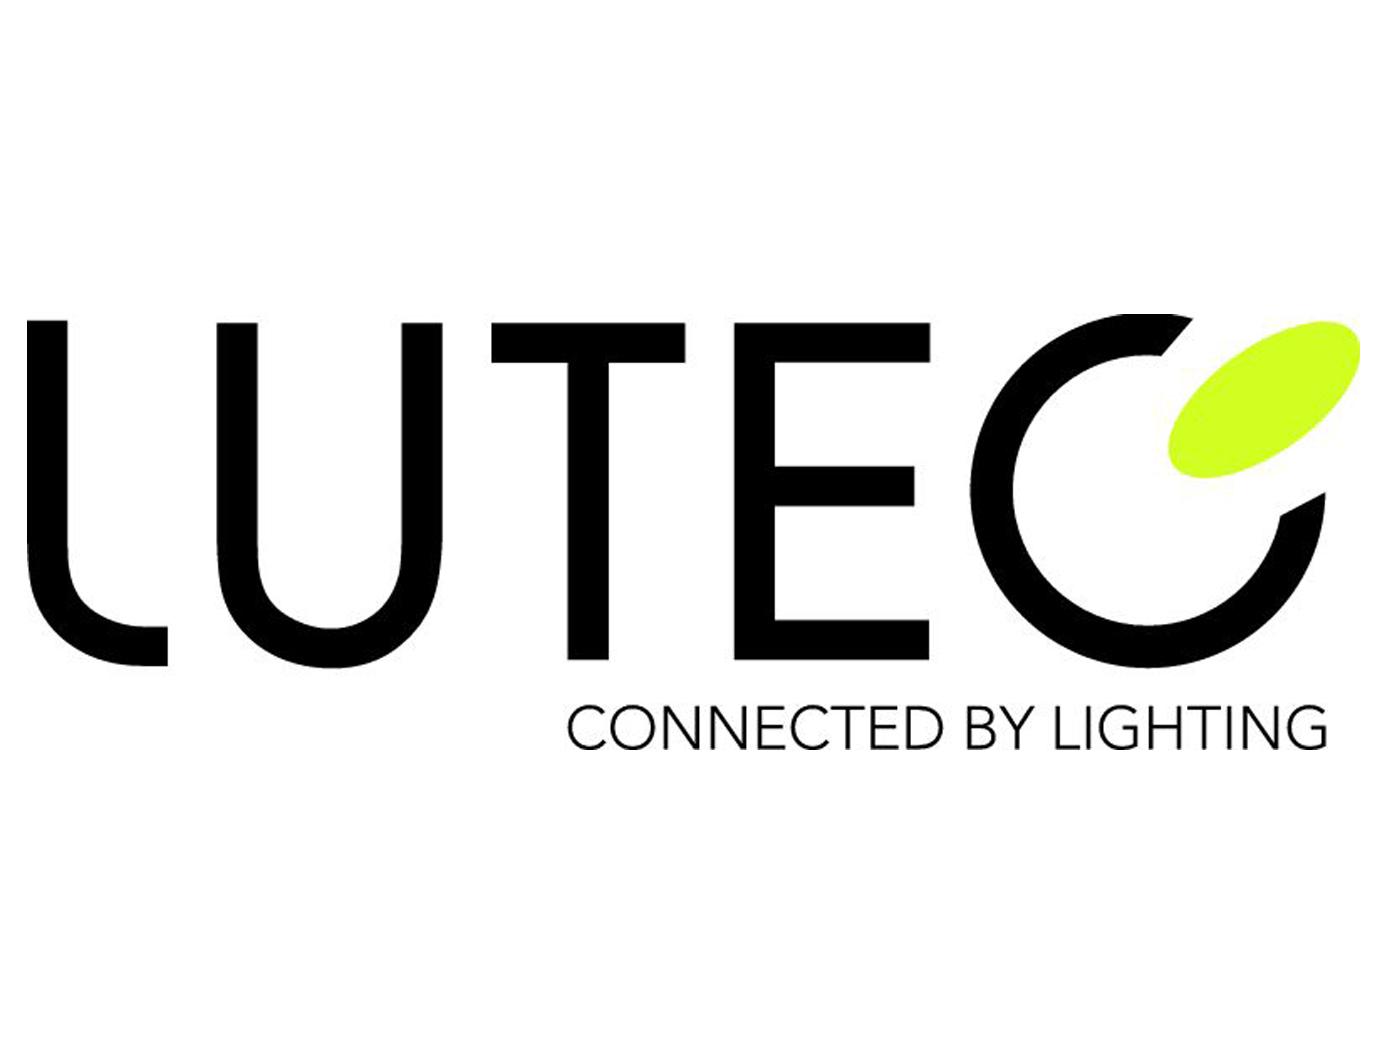 LED-Ausenwandleuchte-mit-Solar-Bewegungsmelder-Hausnummern-IP44-Wandleuchten miniatura 8